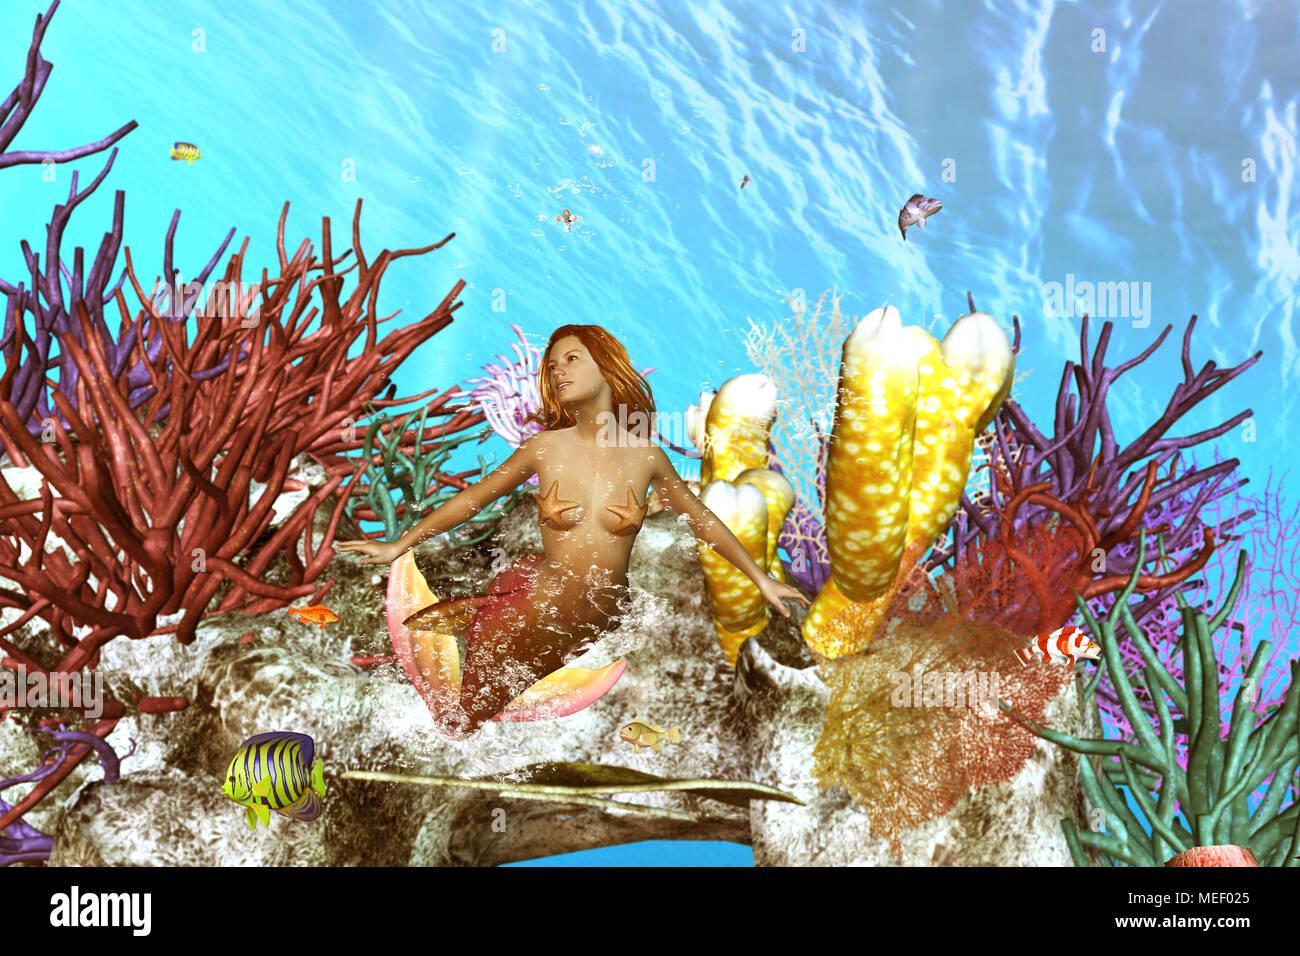 3d illustration of  underwater scene with mermaid ,3d fantasy art for book cover,book illustration - Stock Image